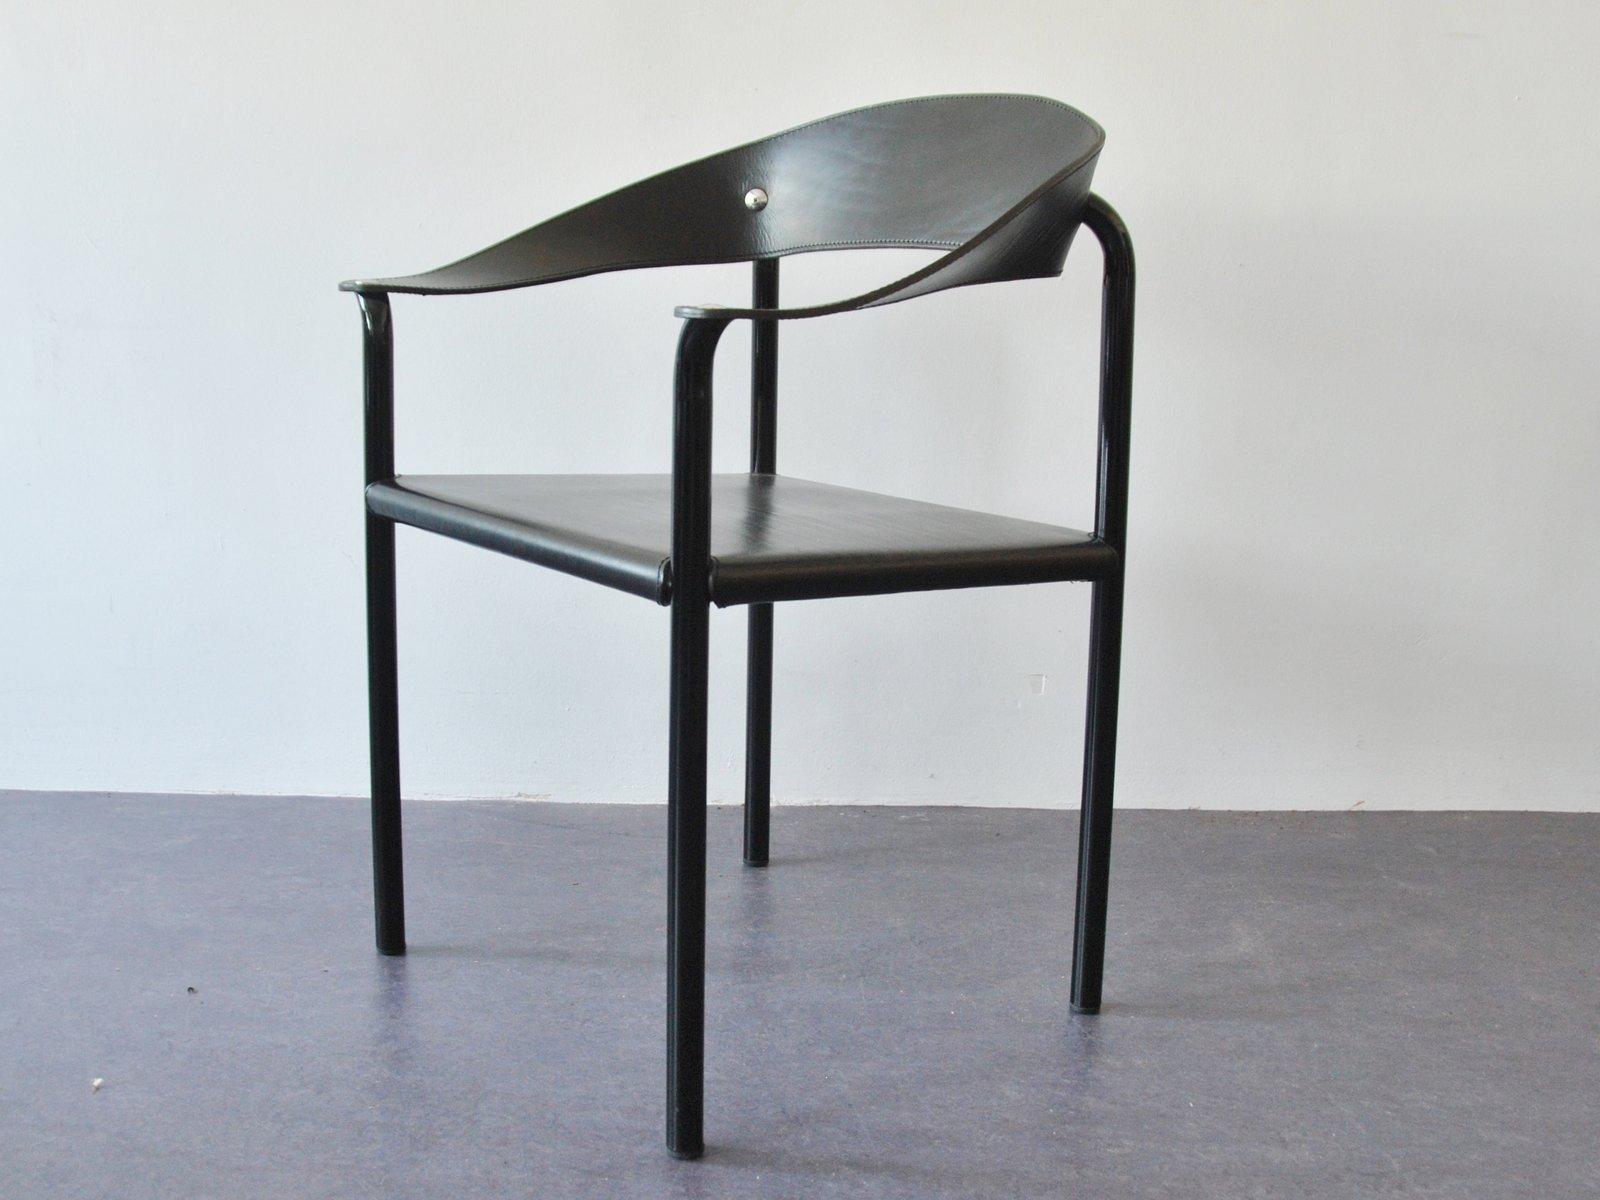 vintage esszimmerst hle aus schwarzem leder schwarz lackiertem metall 4er set bei pamono kaufen. Black Bedroom Furniture Sets. Home Design Ideas